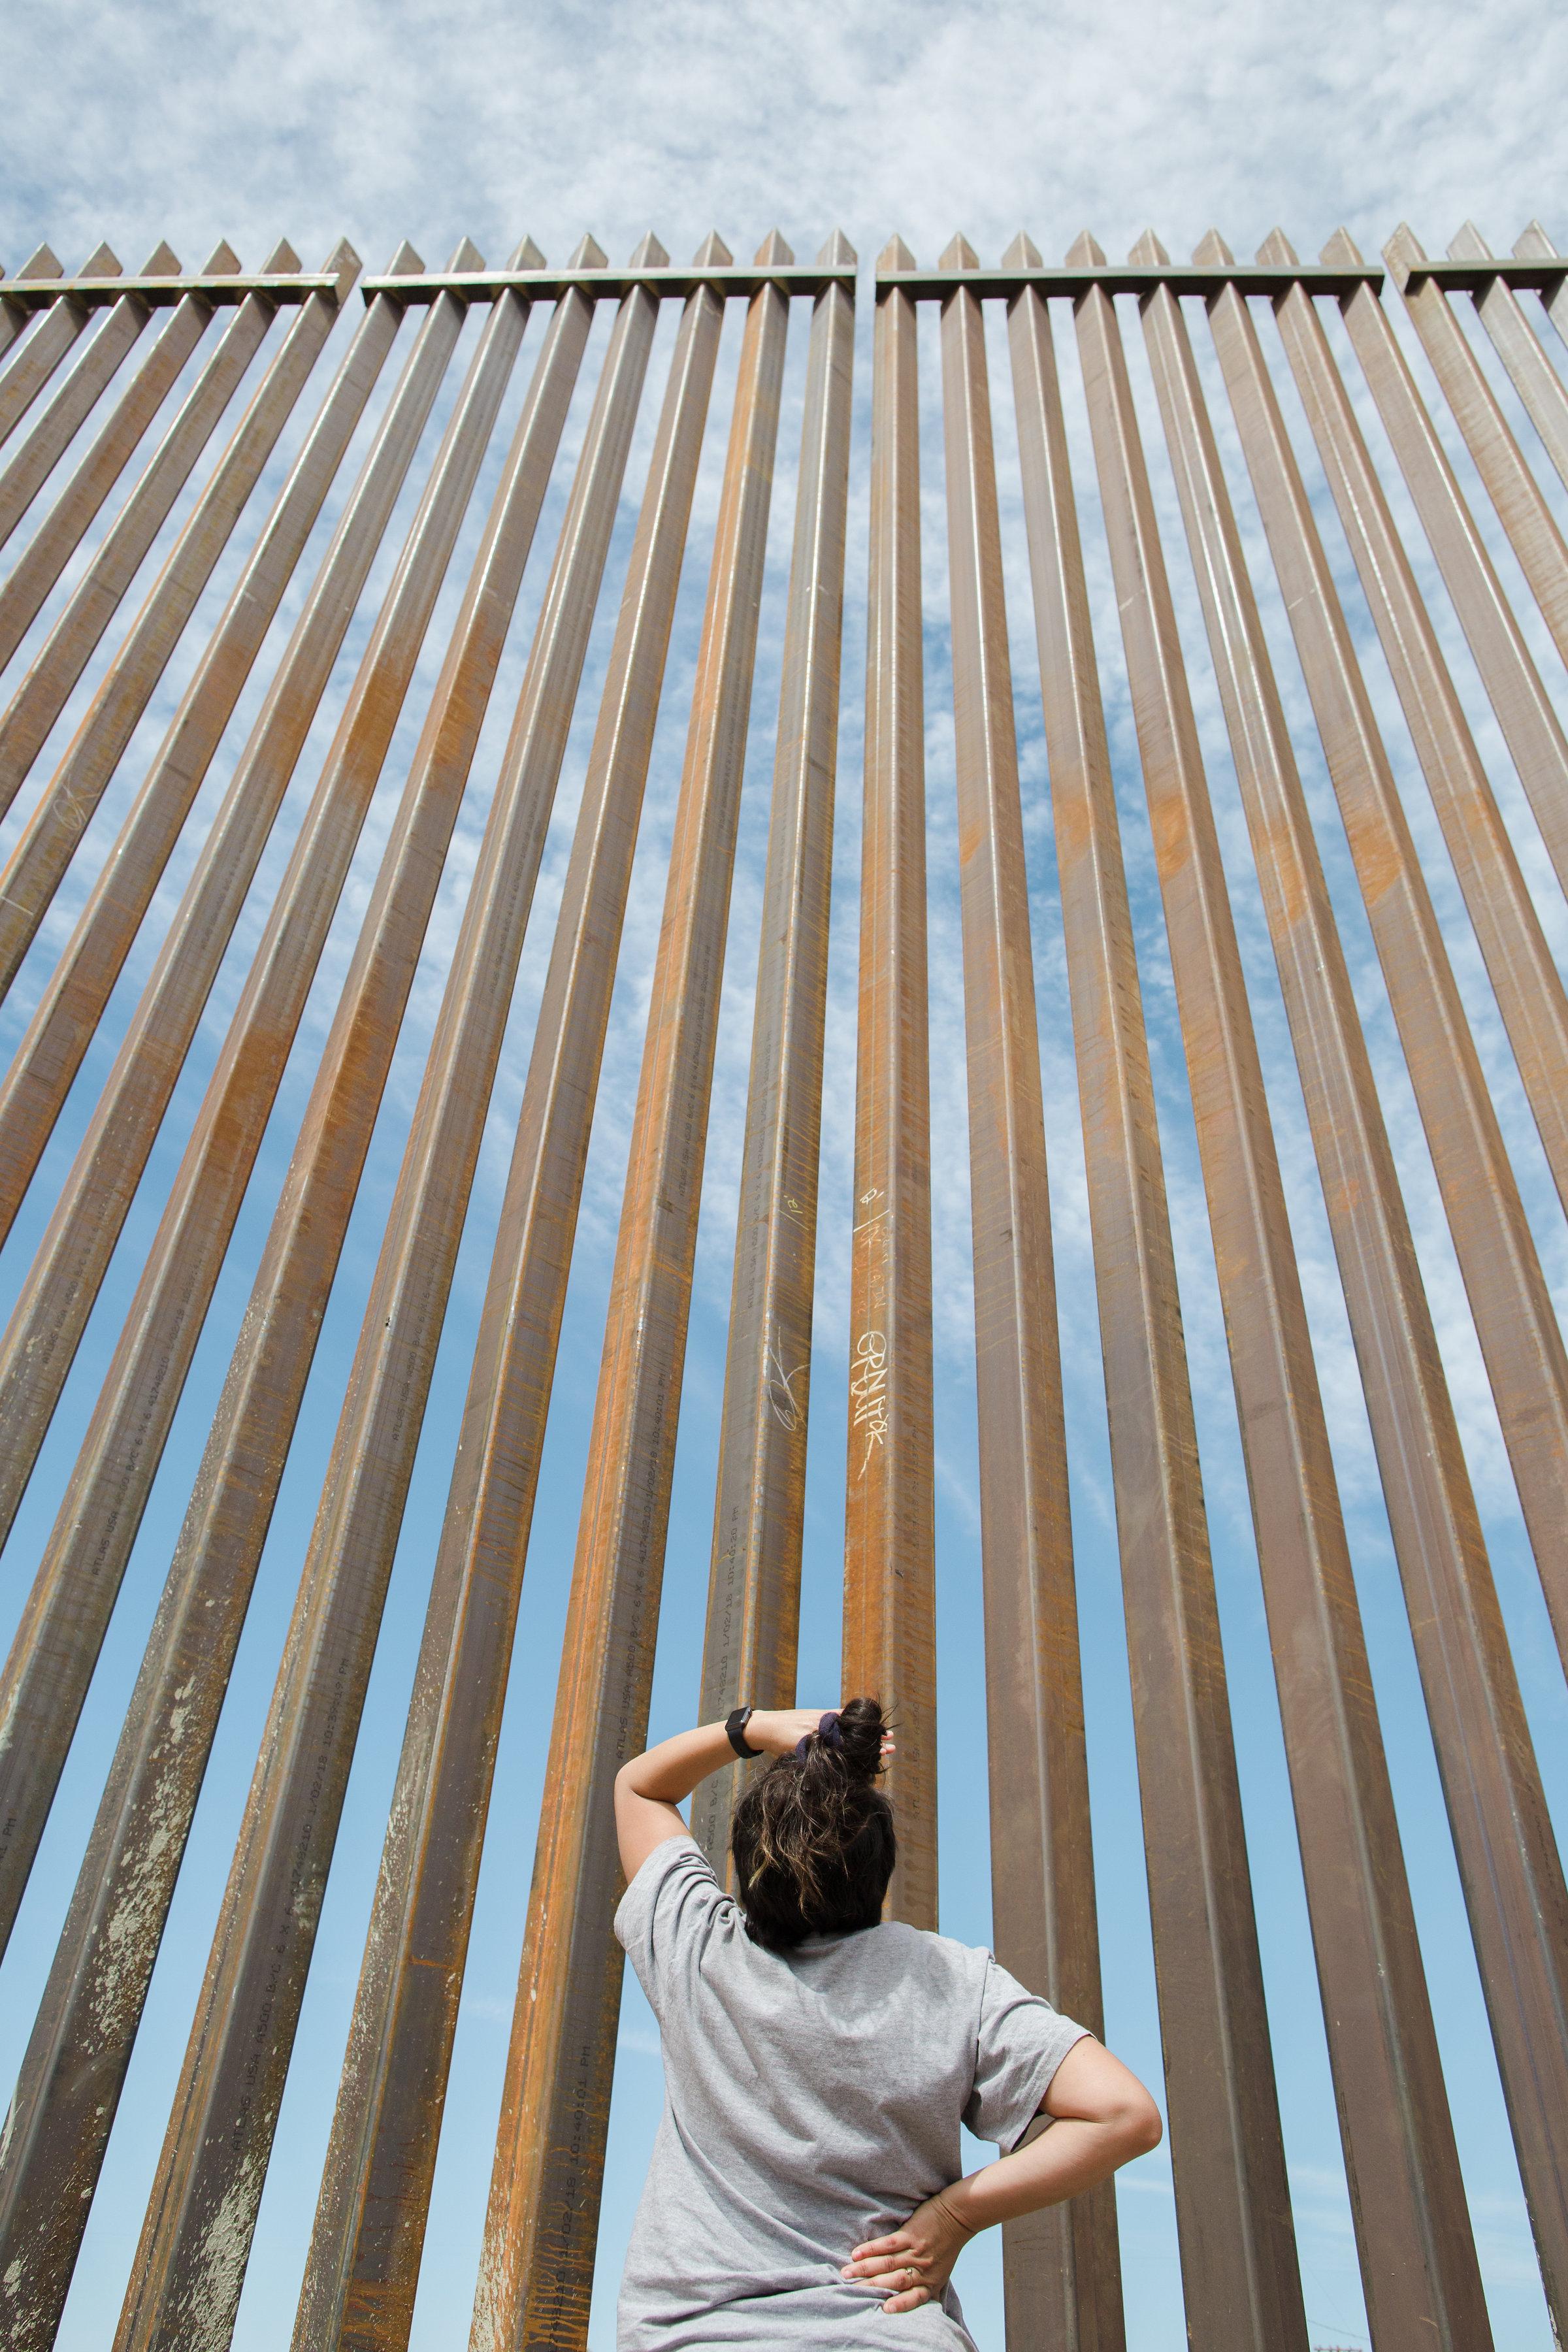 Mexicali-Wall-AMBOSWknd02-0137.jpg